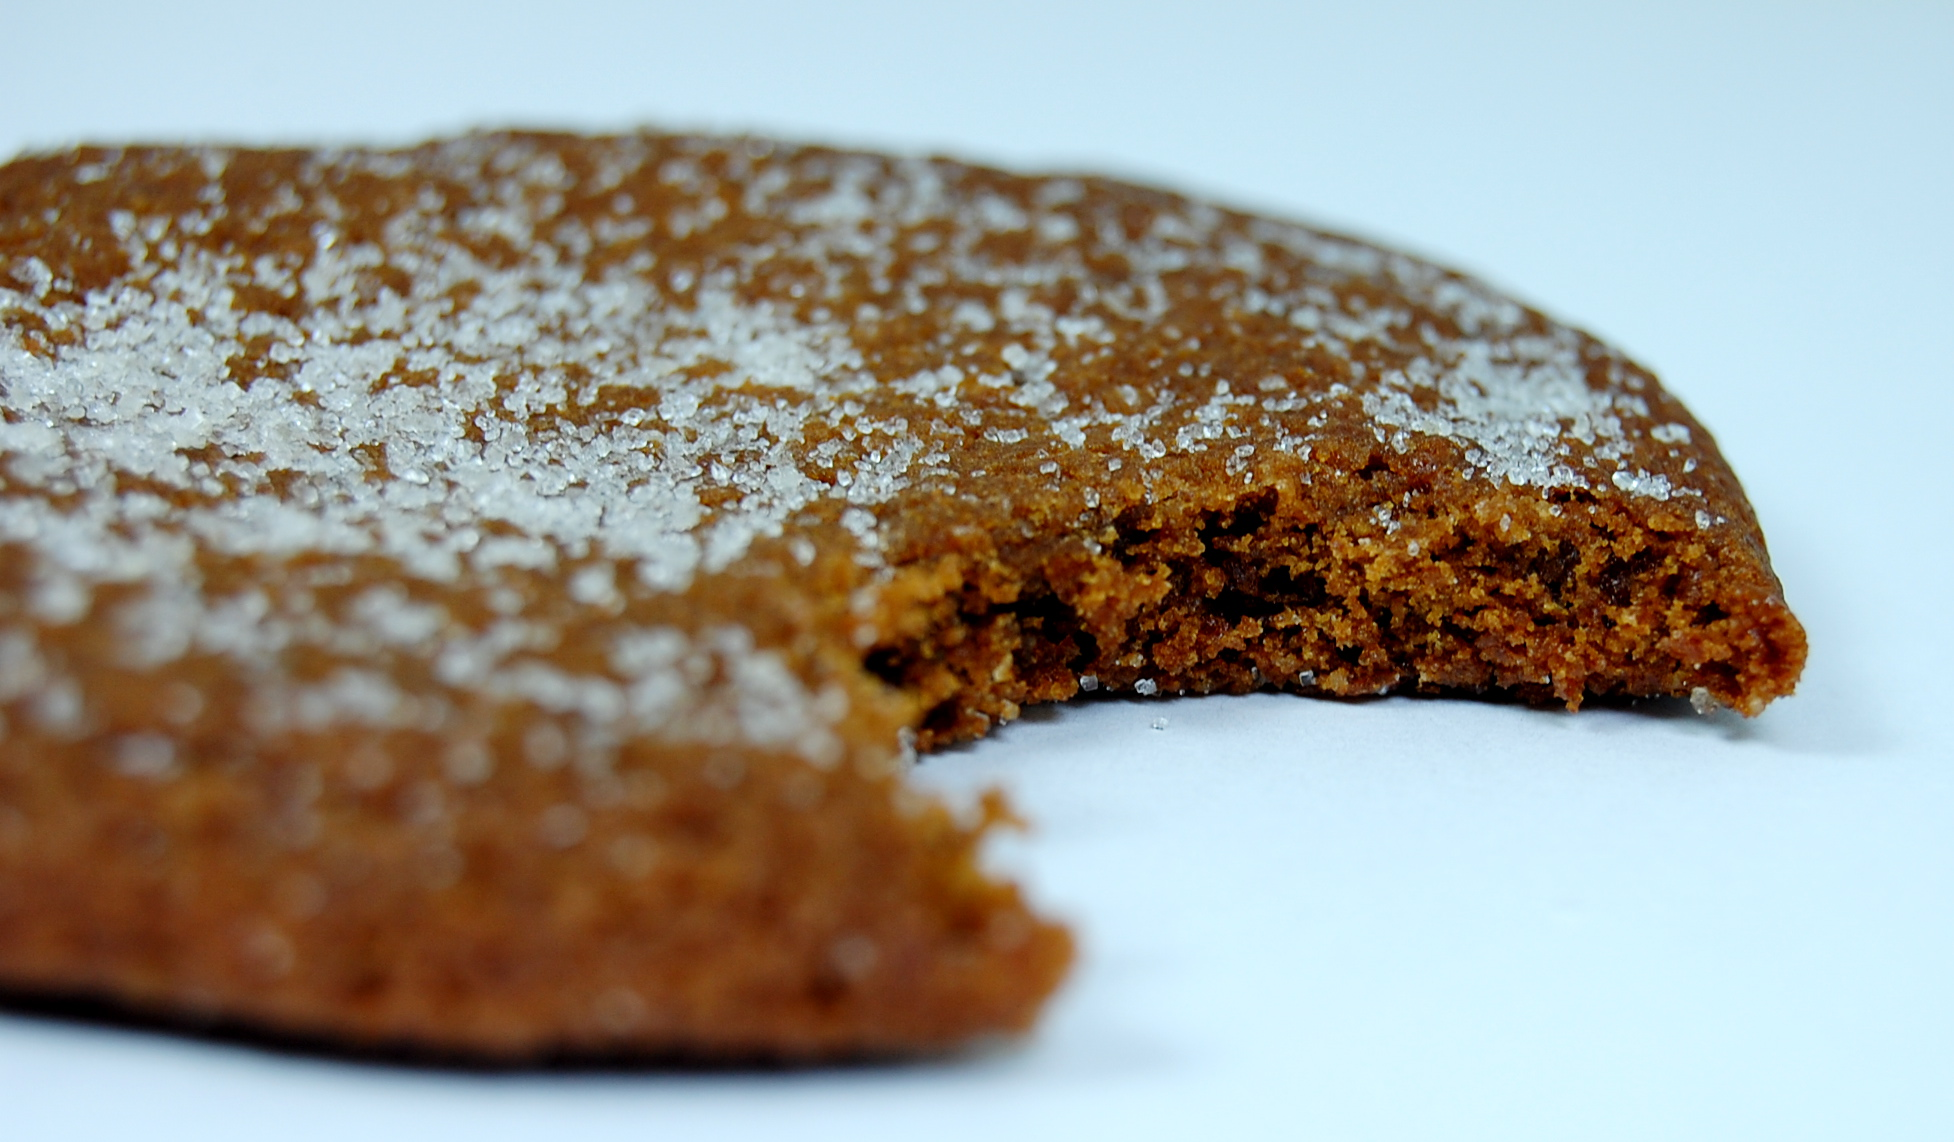 Organica Ginger Cookie - Bite